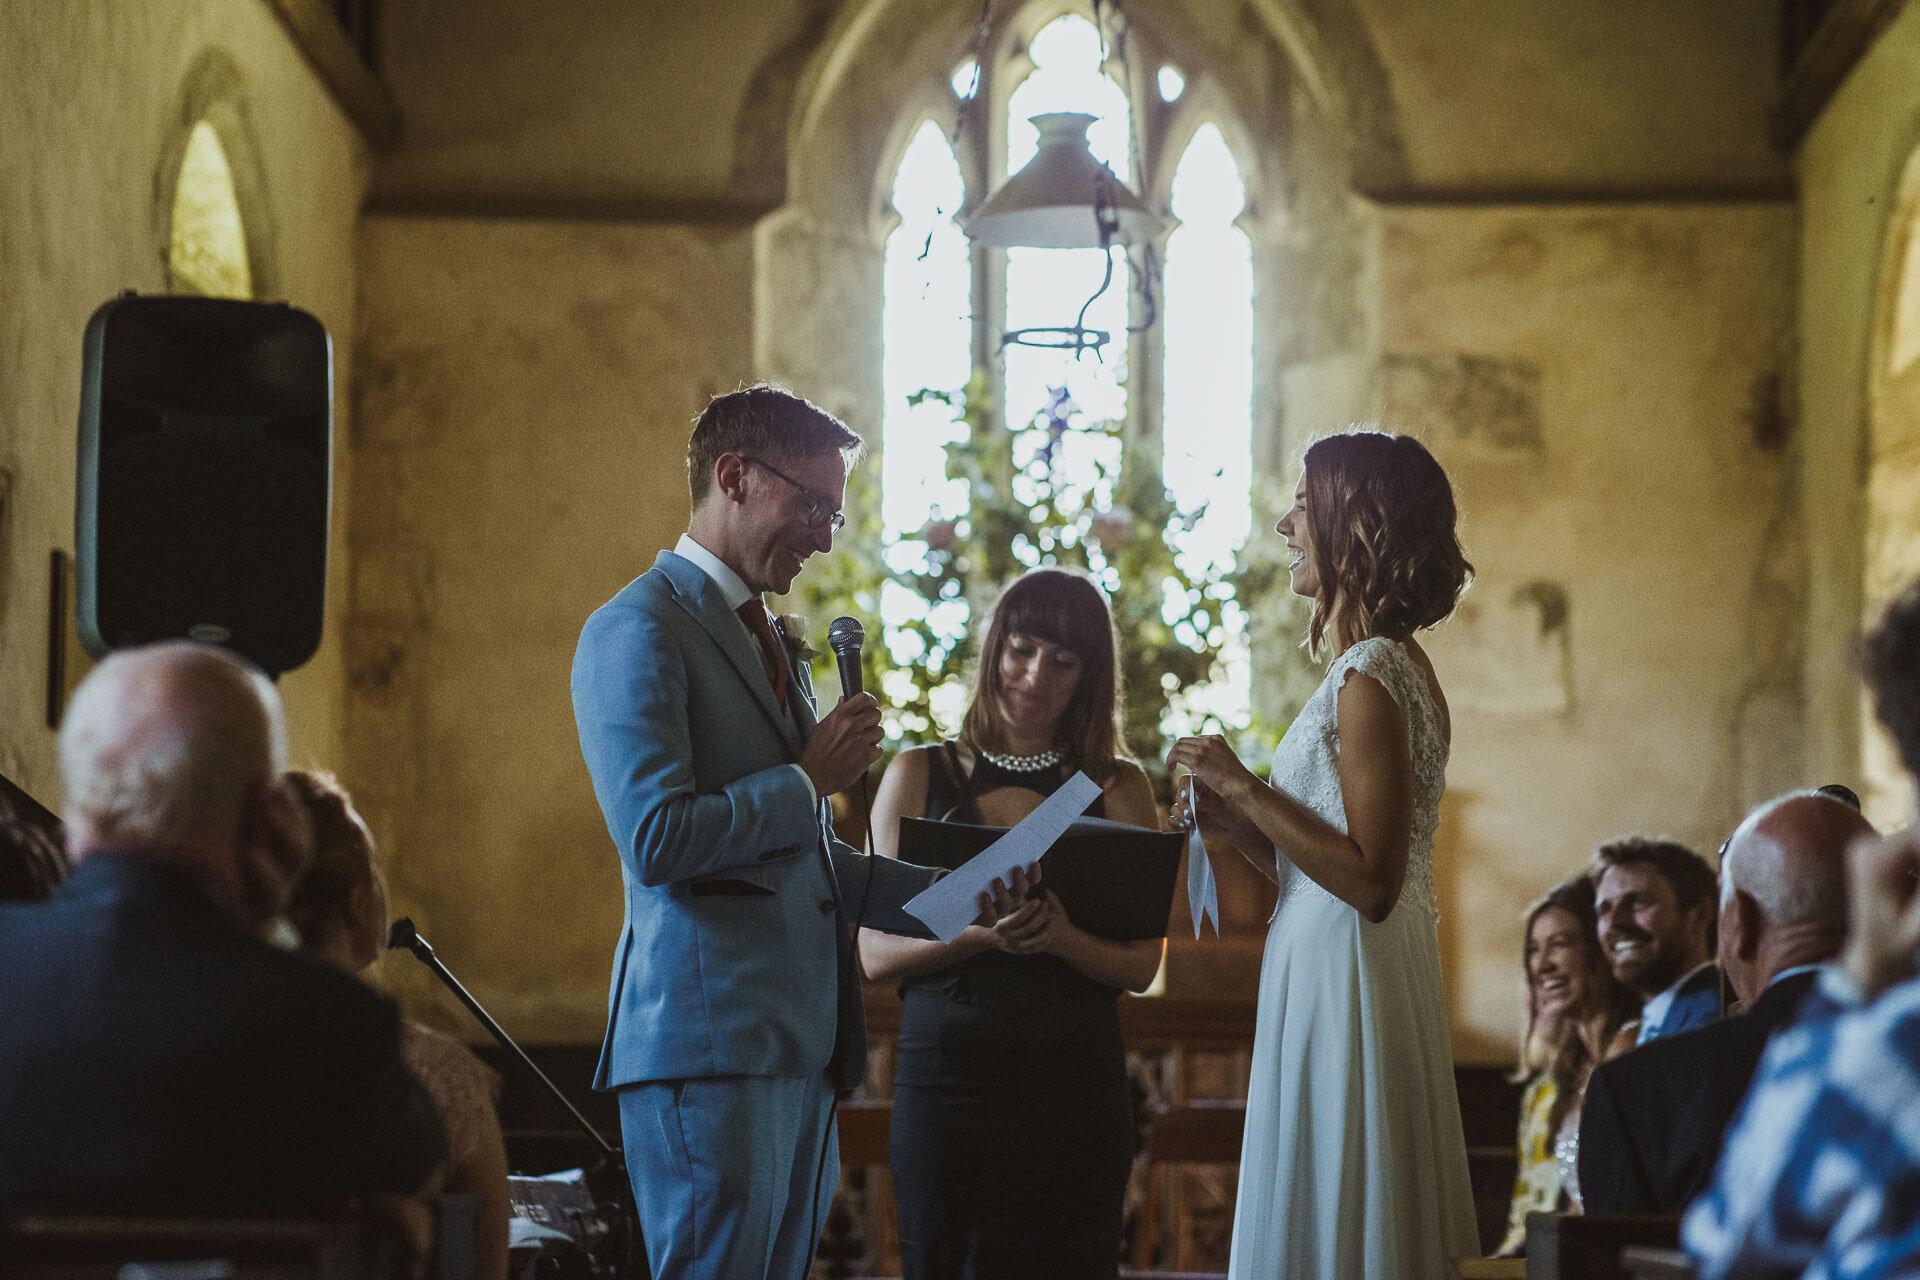 dorset_wedding_photographer-52.jpg